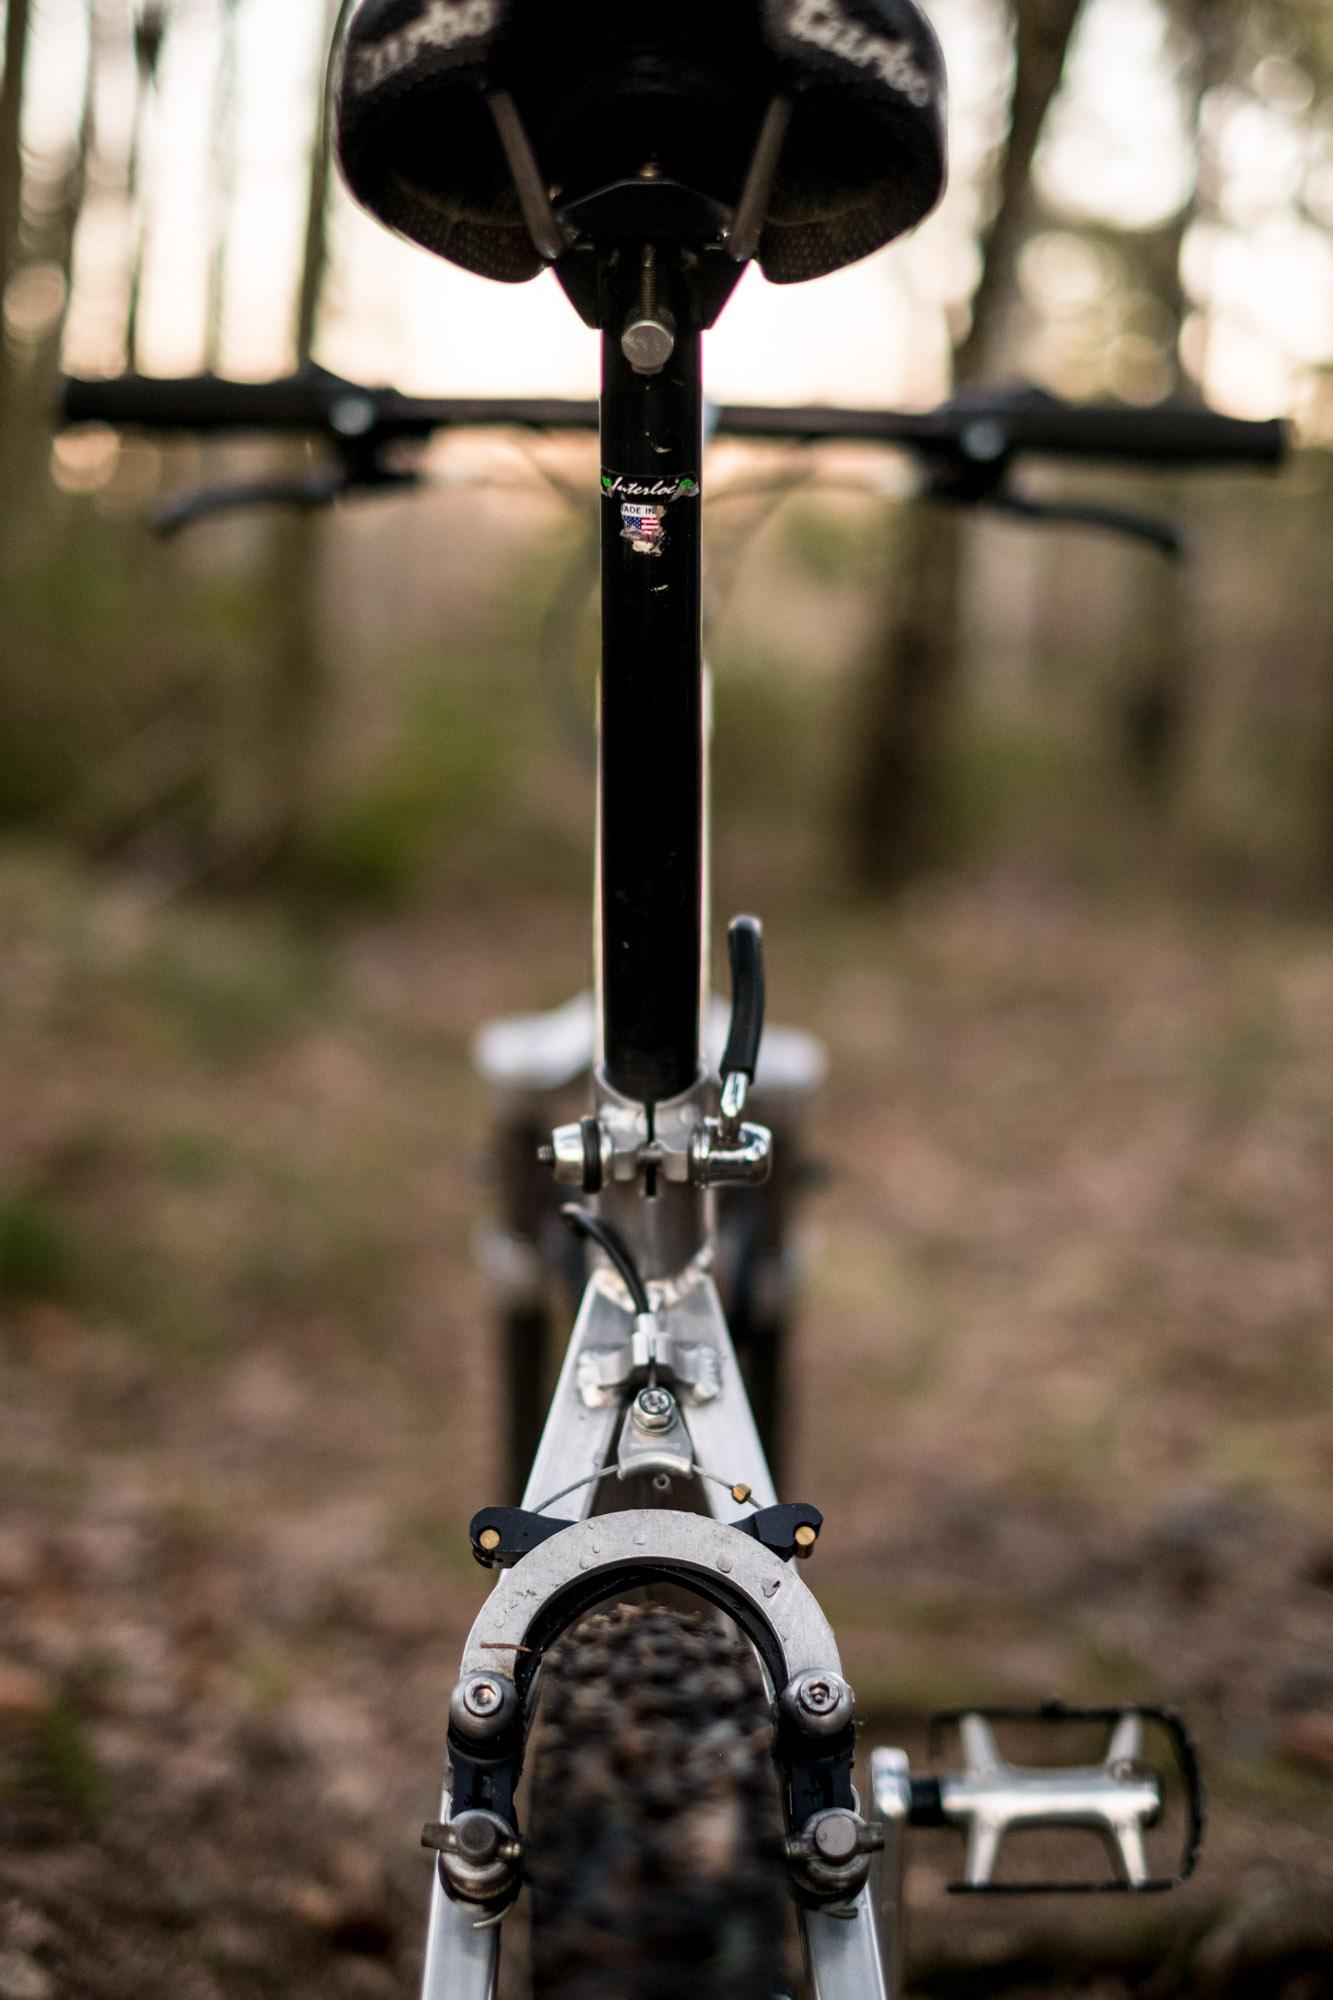 IRD seat post and brake - Bradbury brake arch